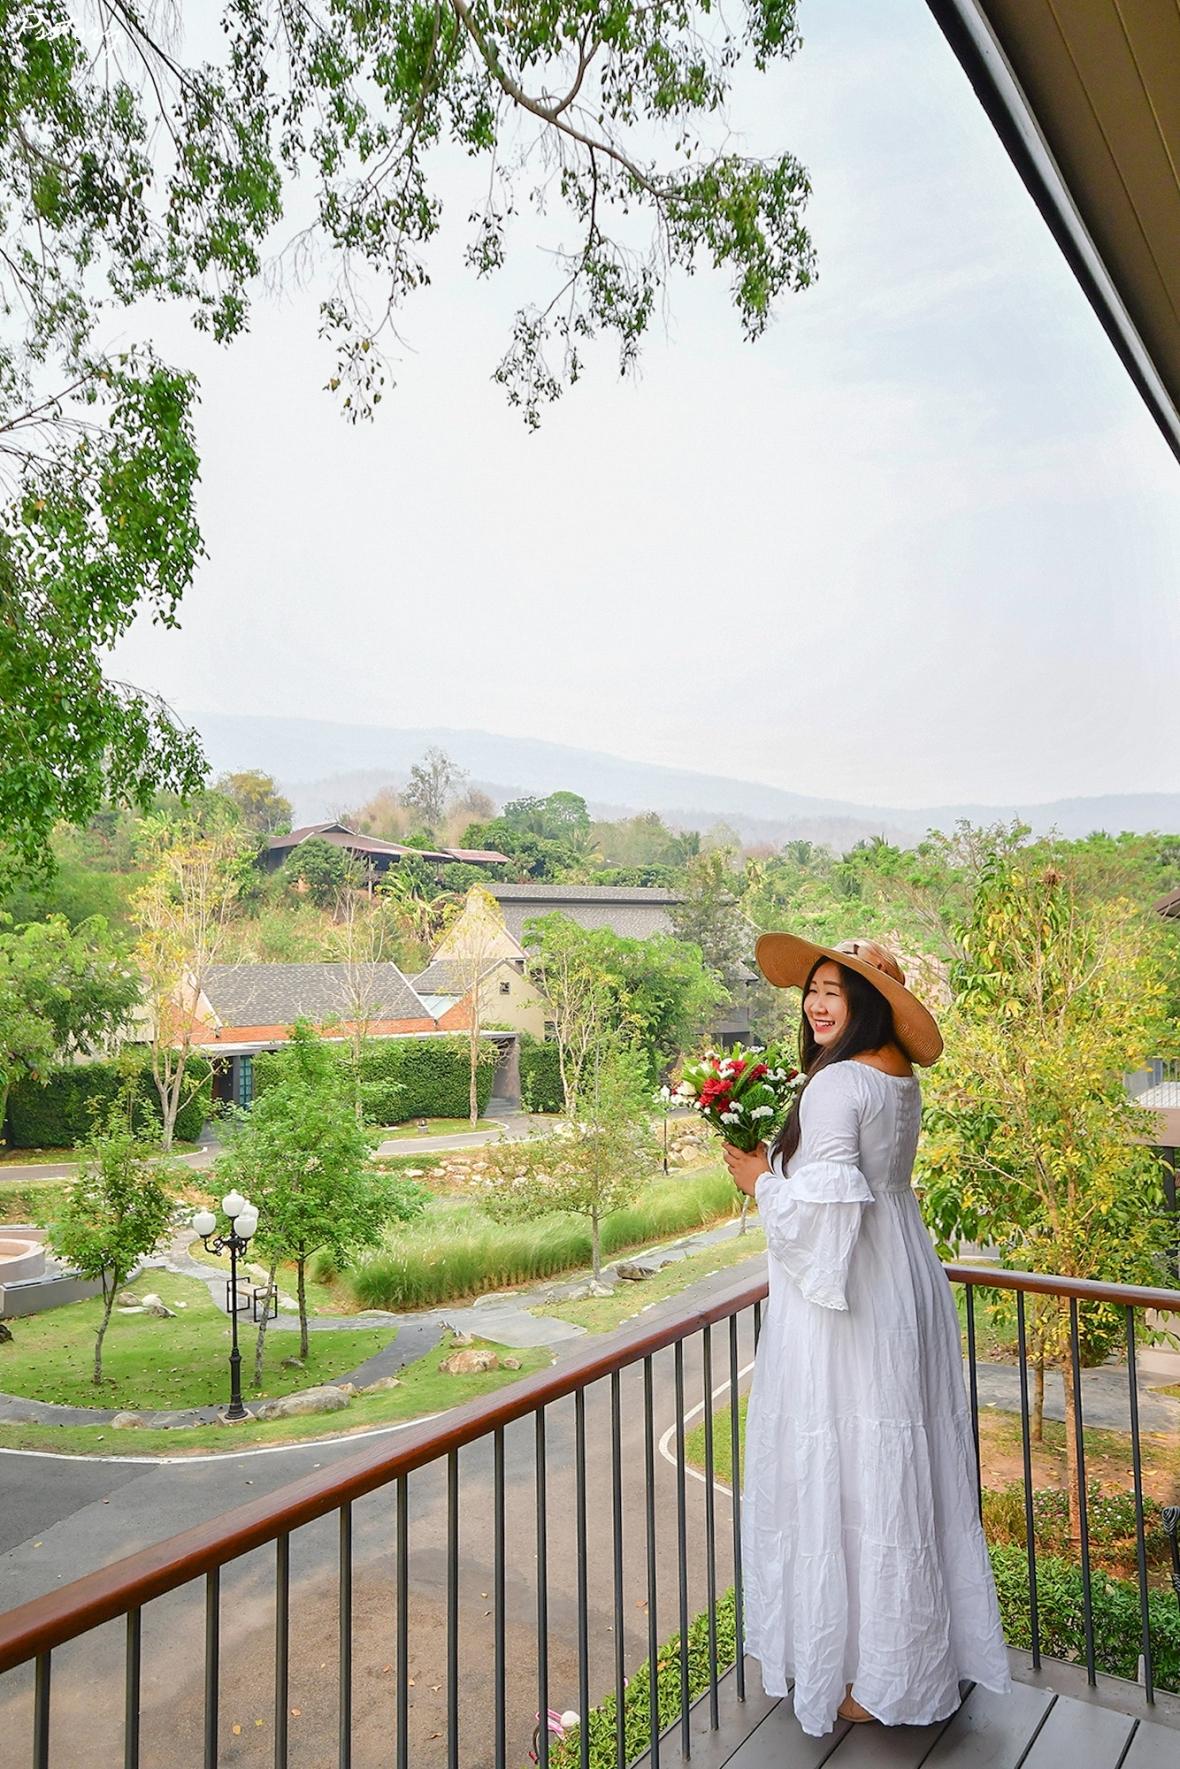 Flora Creek Chiang Mai (54)